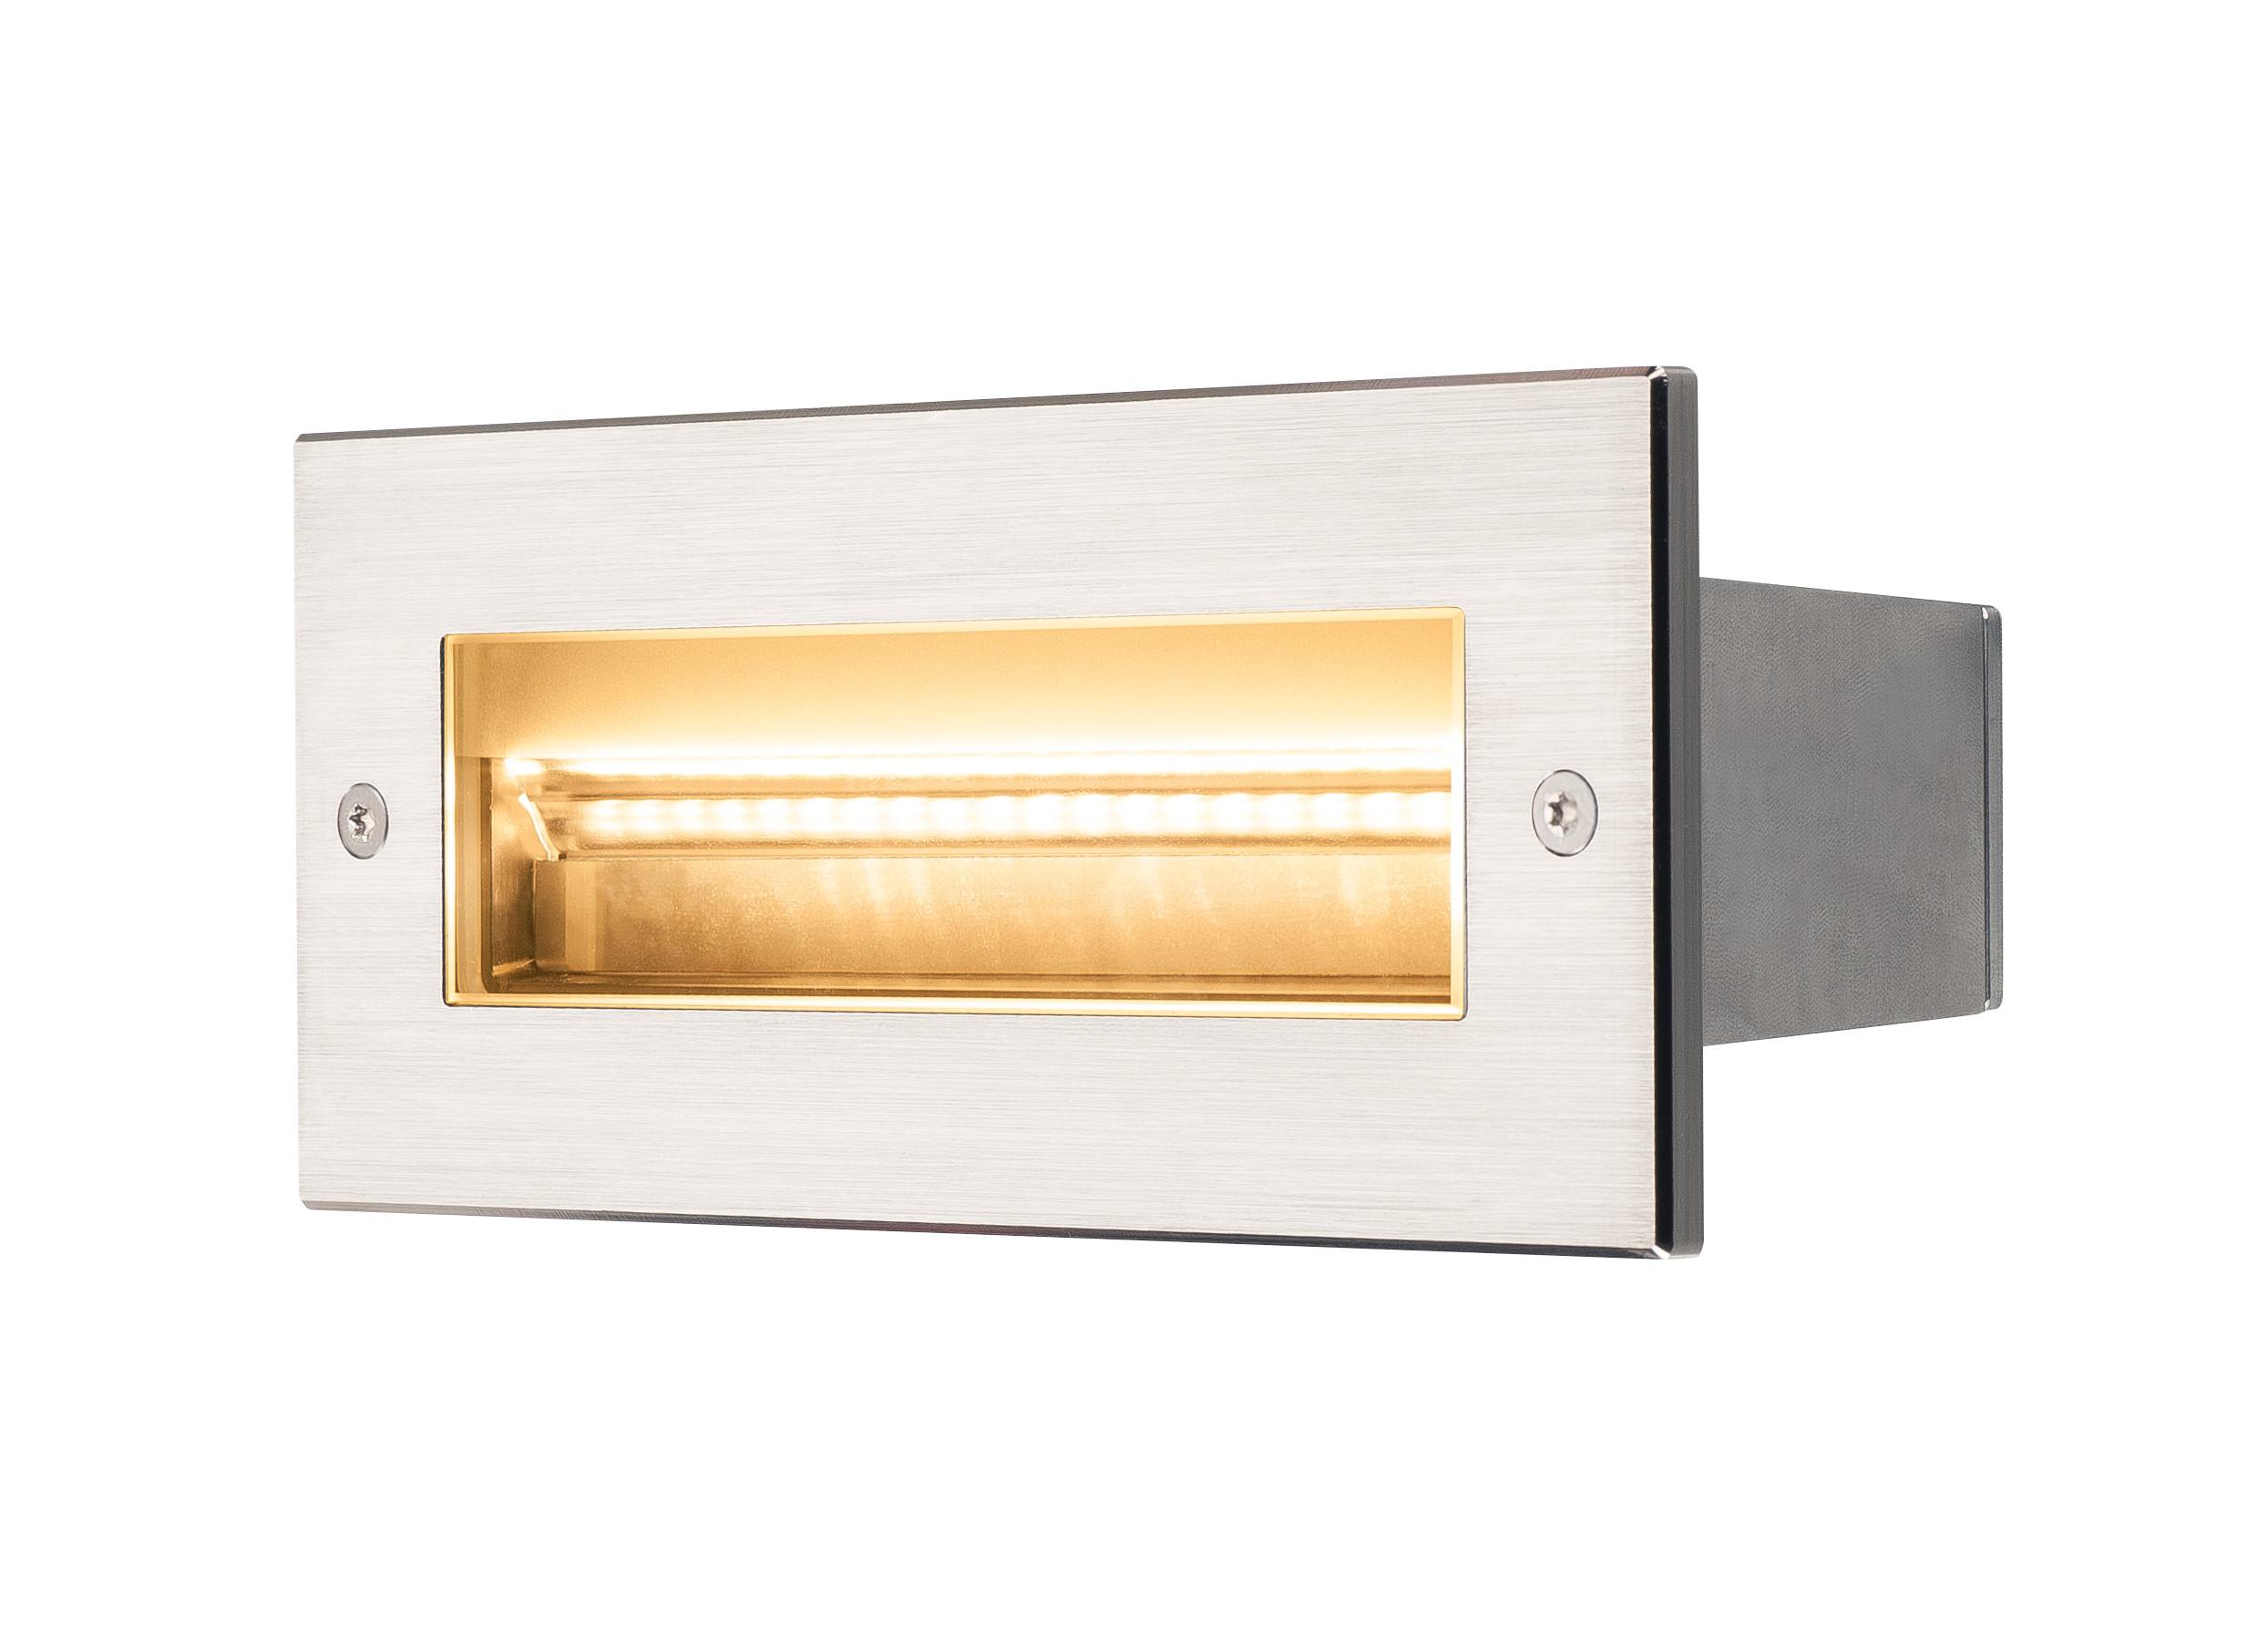 1 Stk BRICK Pro LED, Outdoor Wandeinbauleuchte, 230V, IP67, 850lm LI233661--